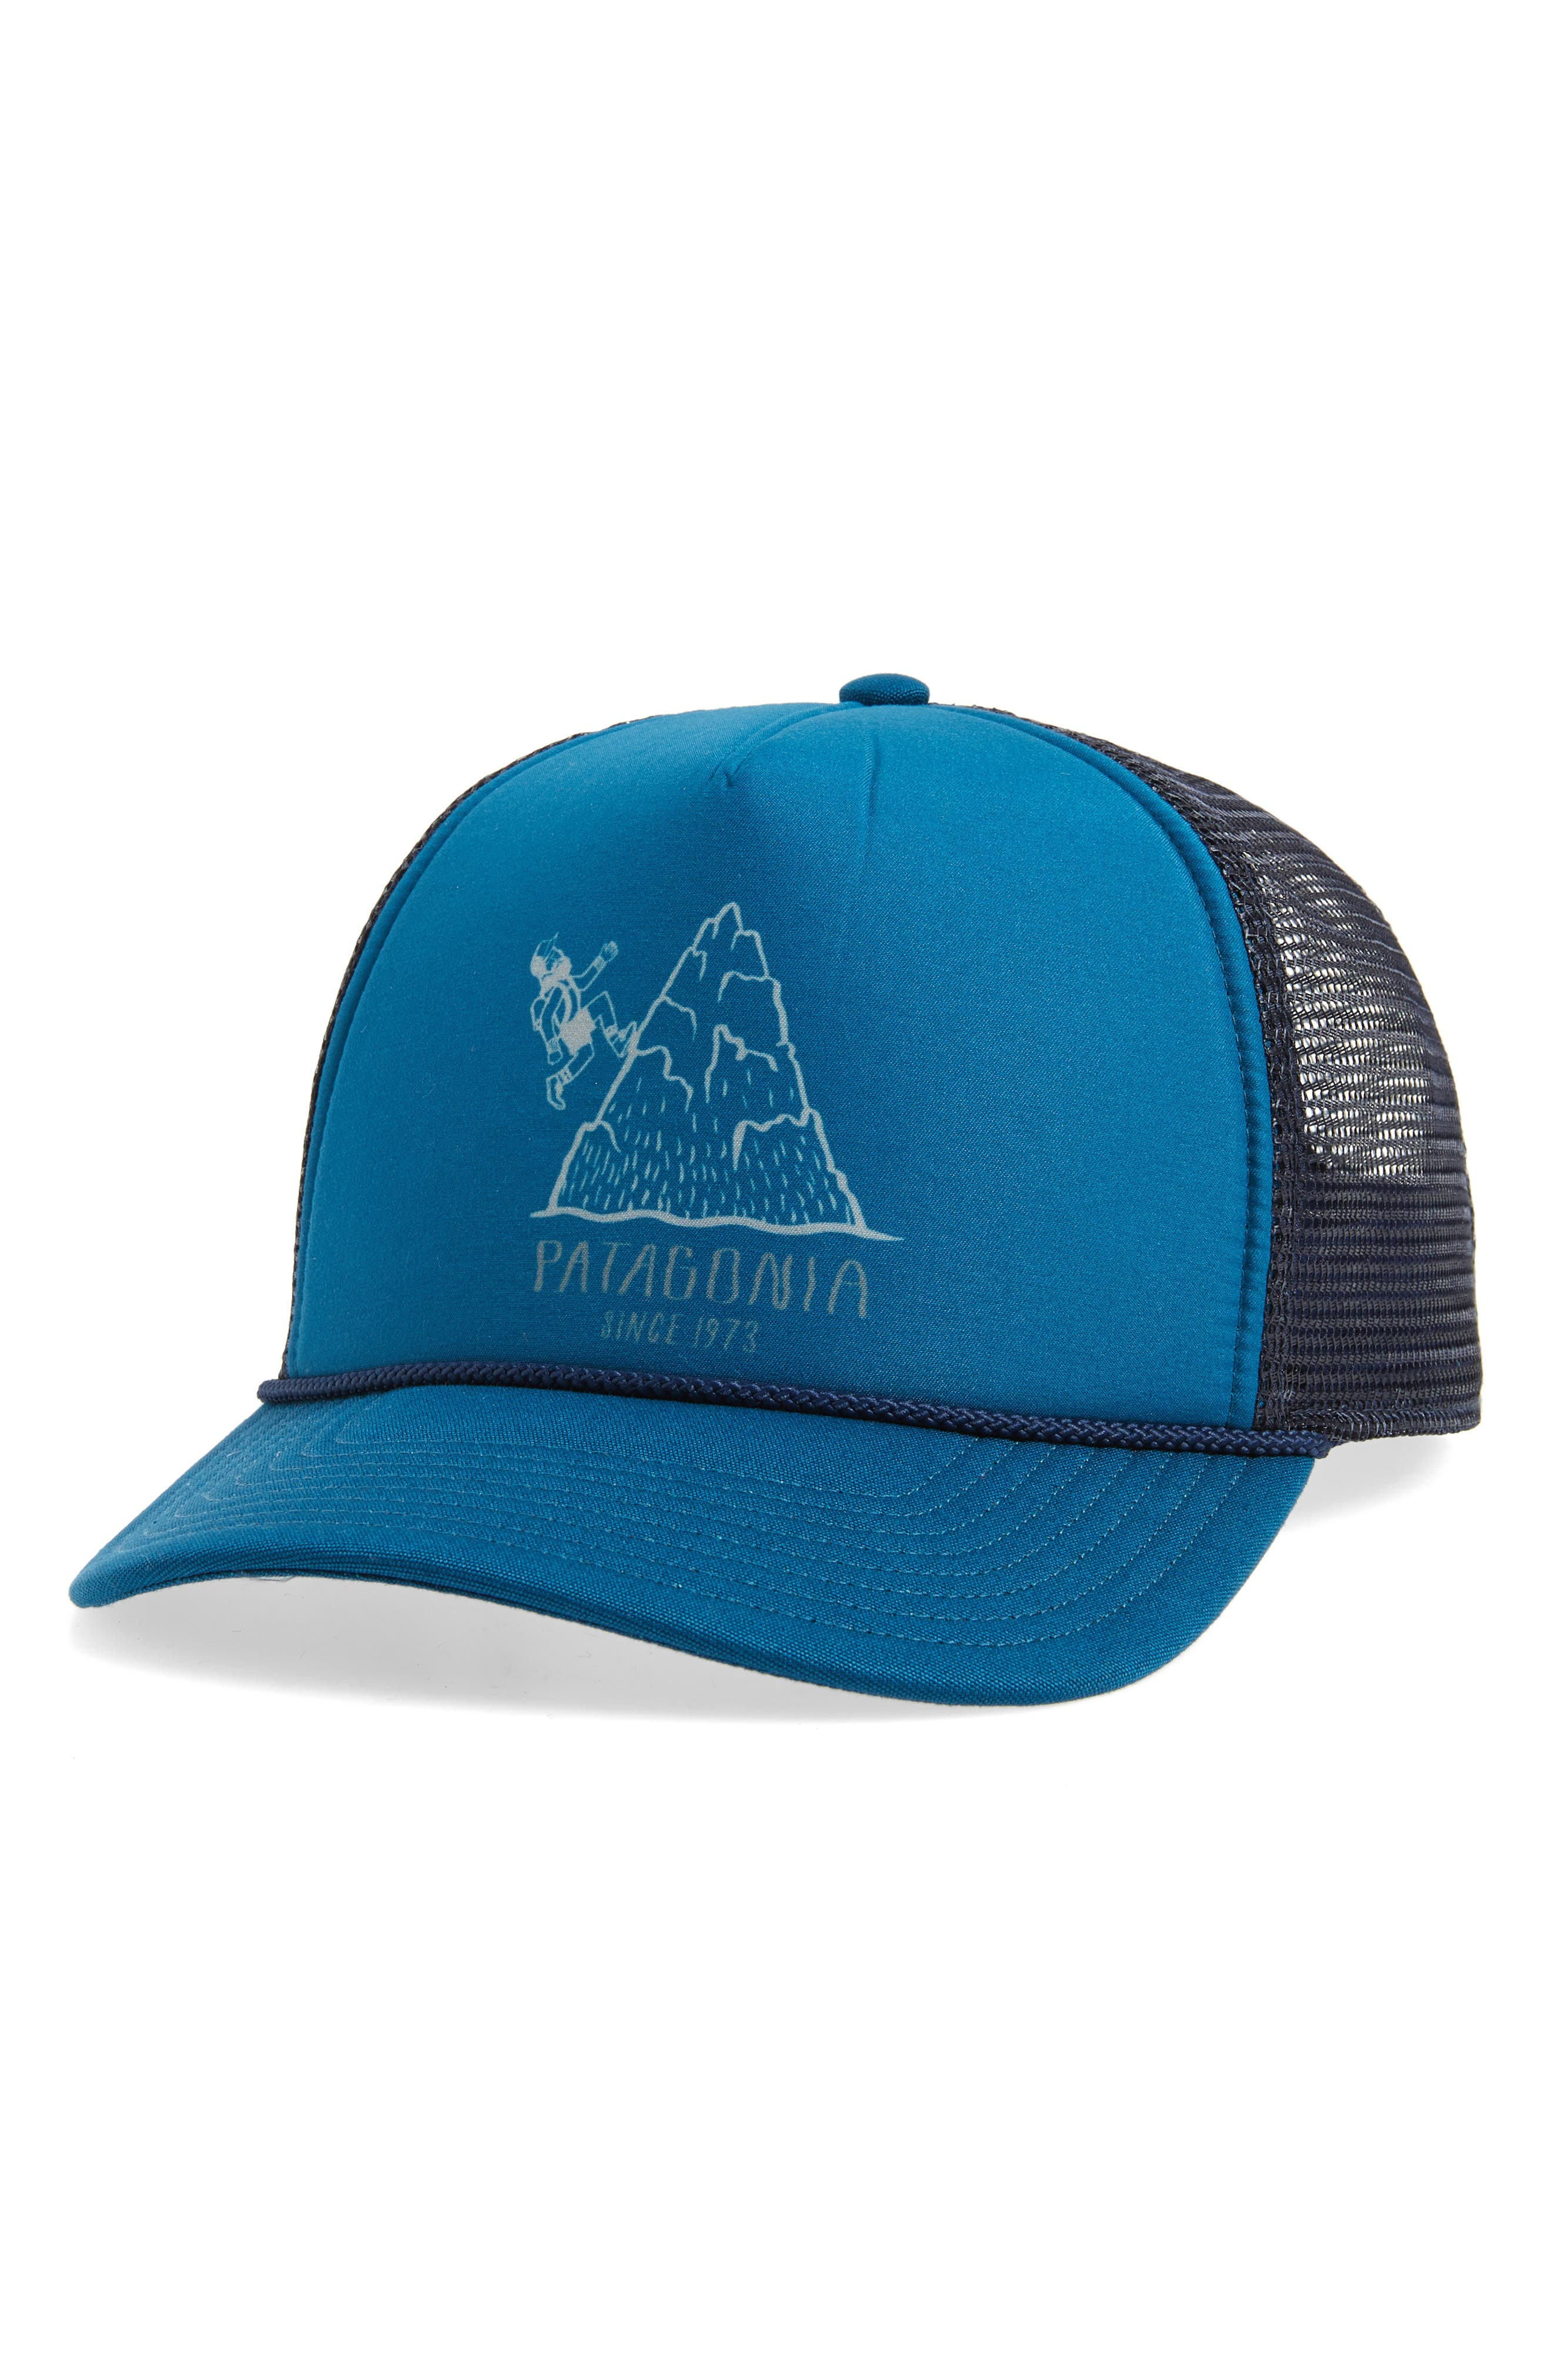 Hoofin' It Interstate Trucker Hat,                             Main thumbnail 1, color,                             400